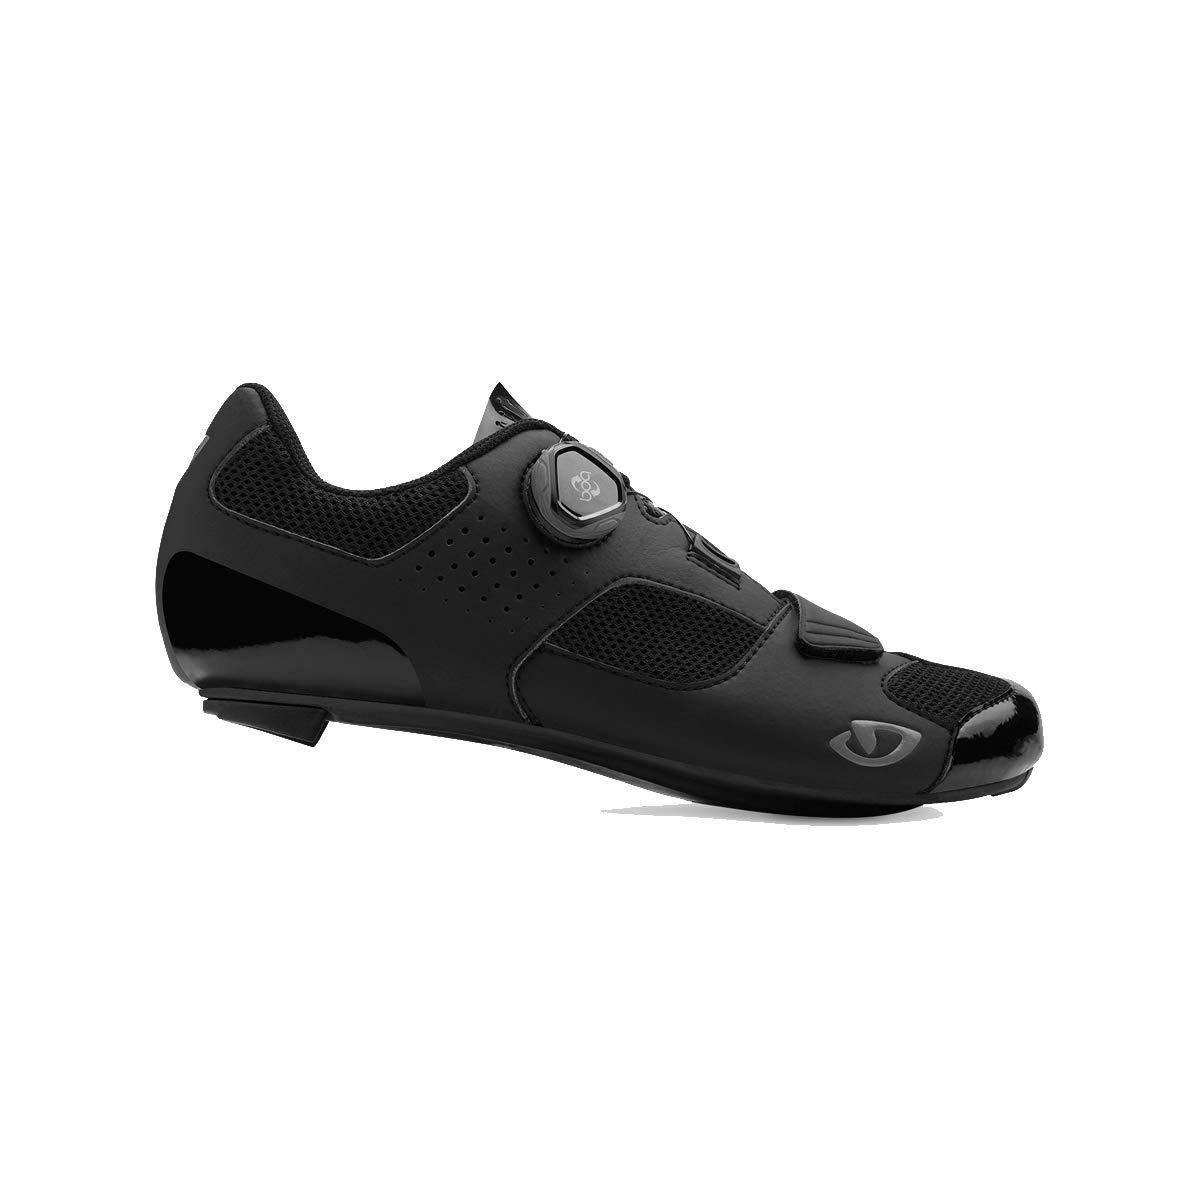 Giro Herren Trans Boa Hv+ Radsportschuhe-Rennrad Radsportschuhe-Rennrad Radsportschuhe-Rennrad adf5b9